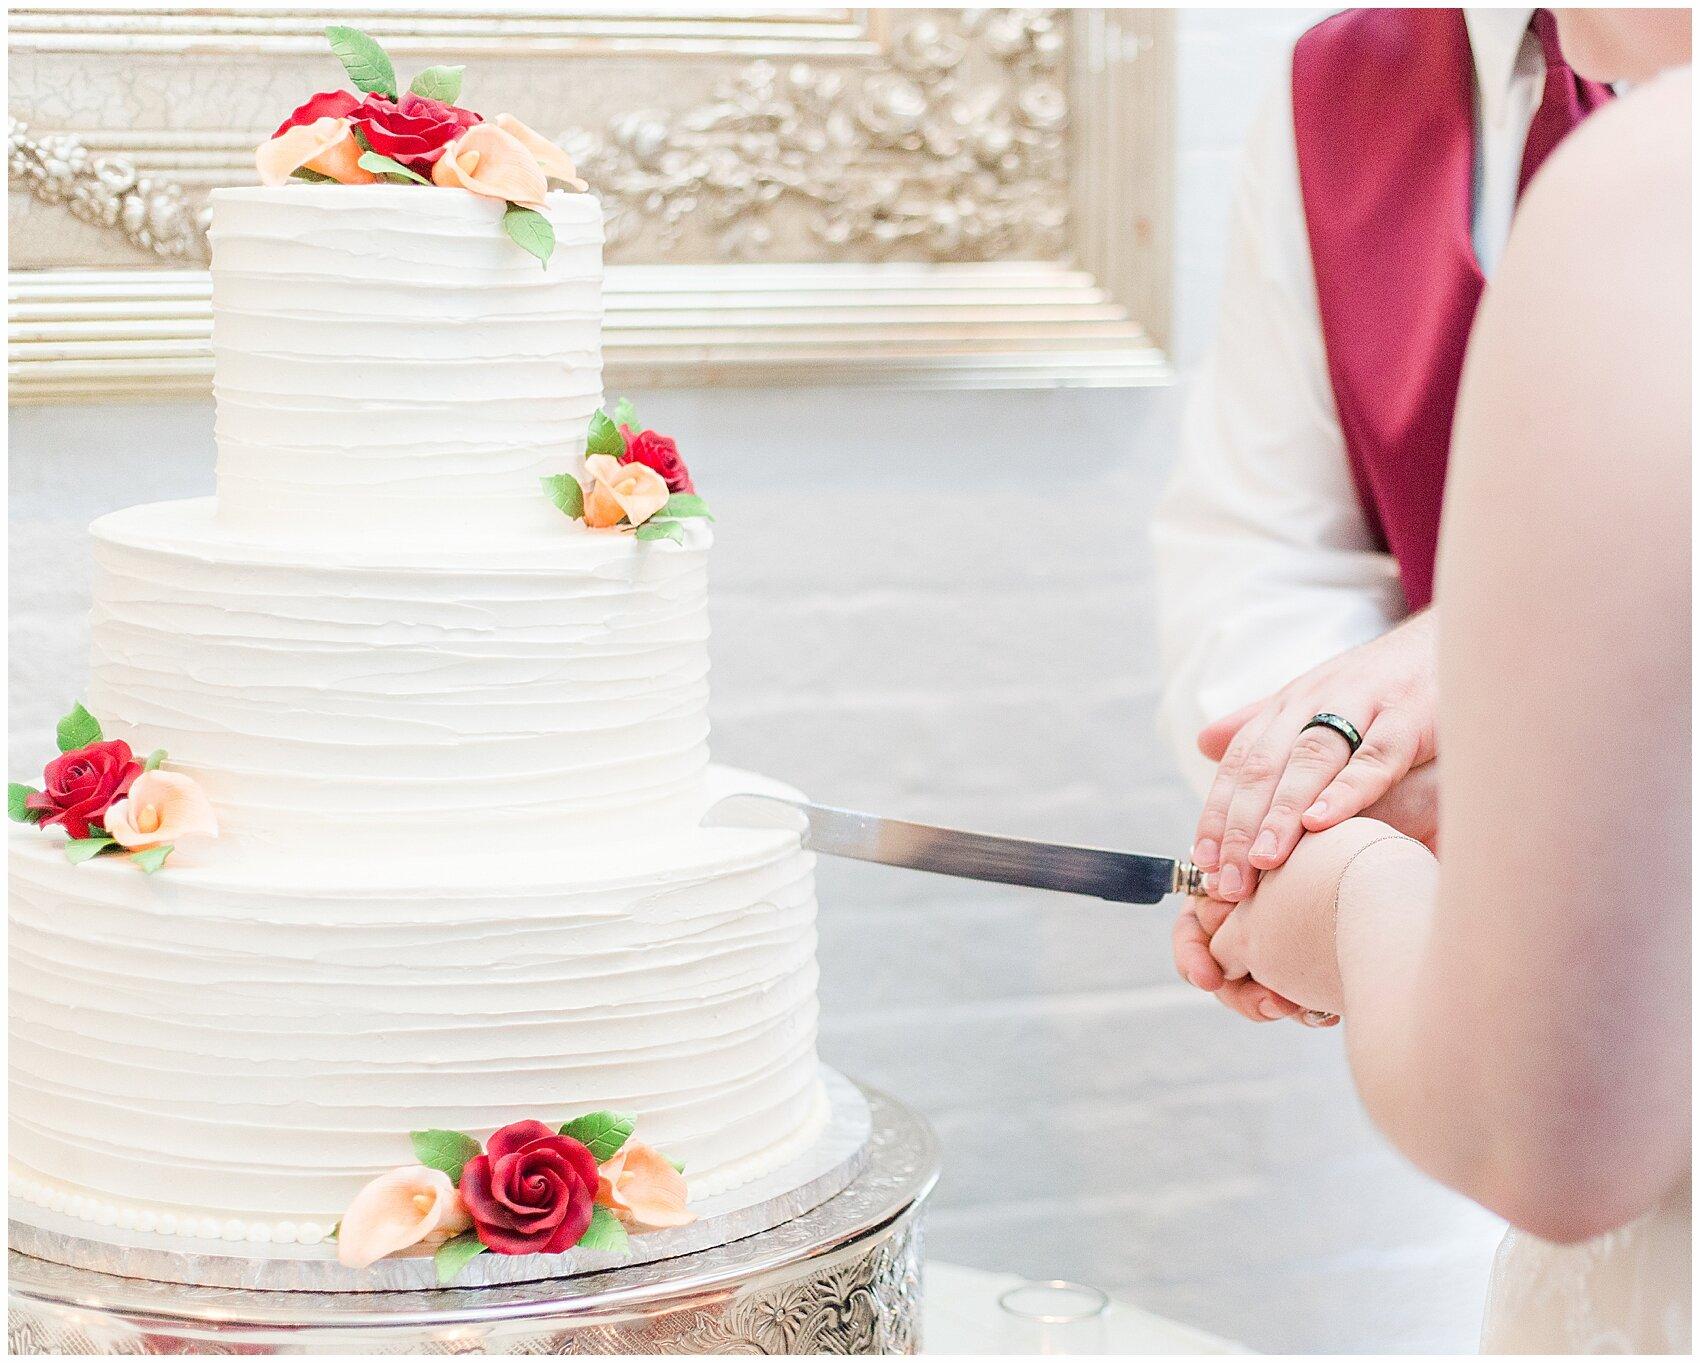 HOW-TO-CUT-A-WEDDING-CAKE_0002.jpg